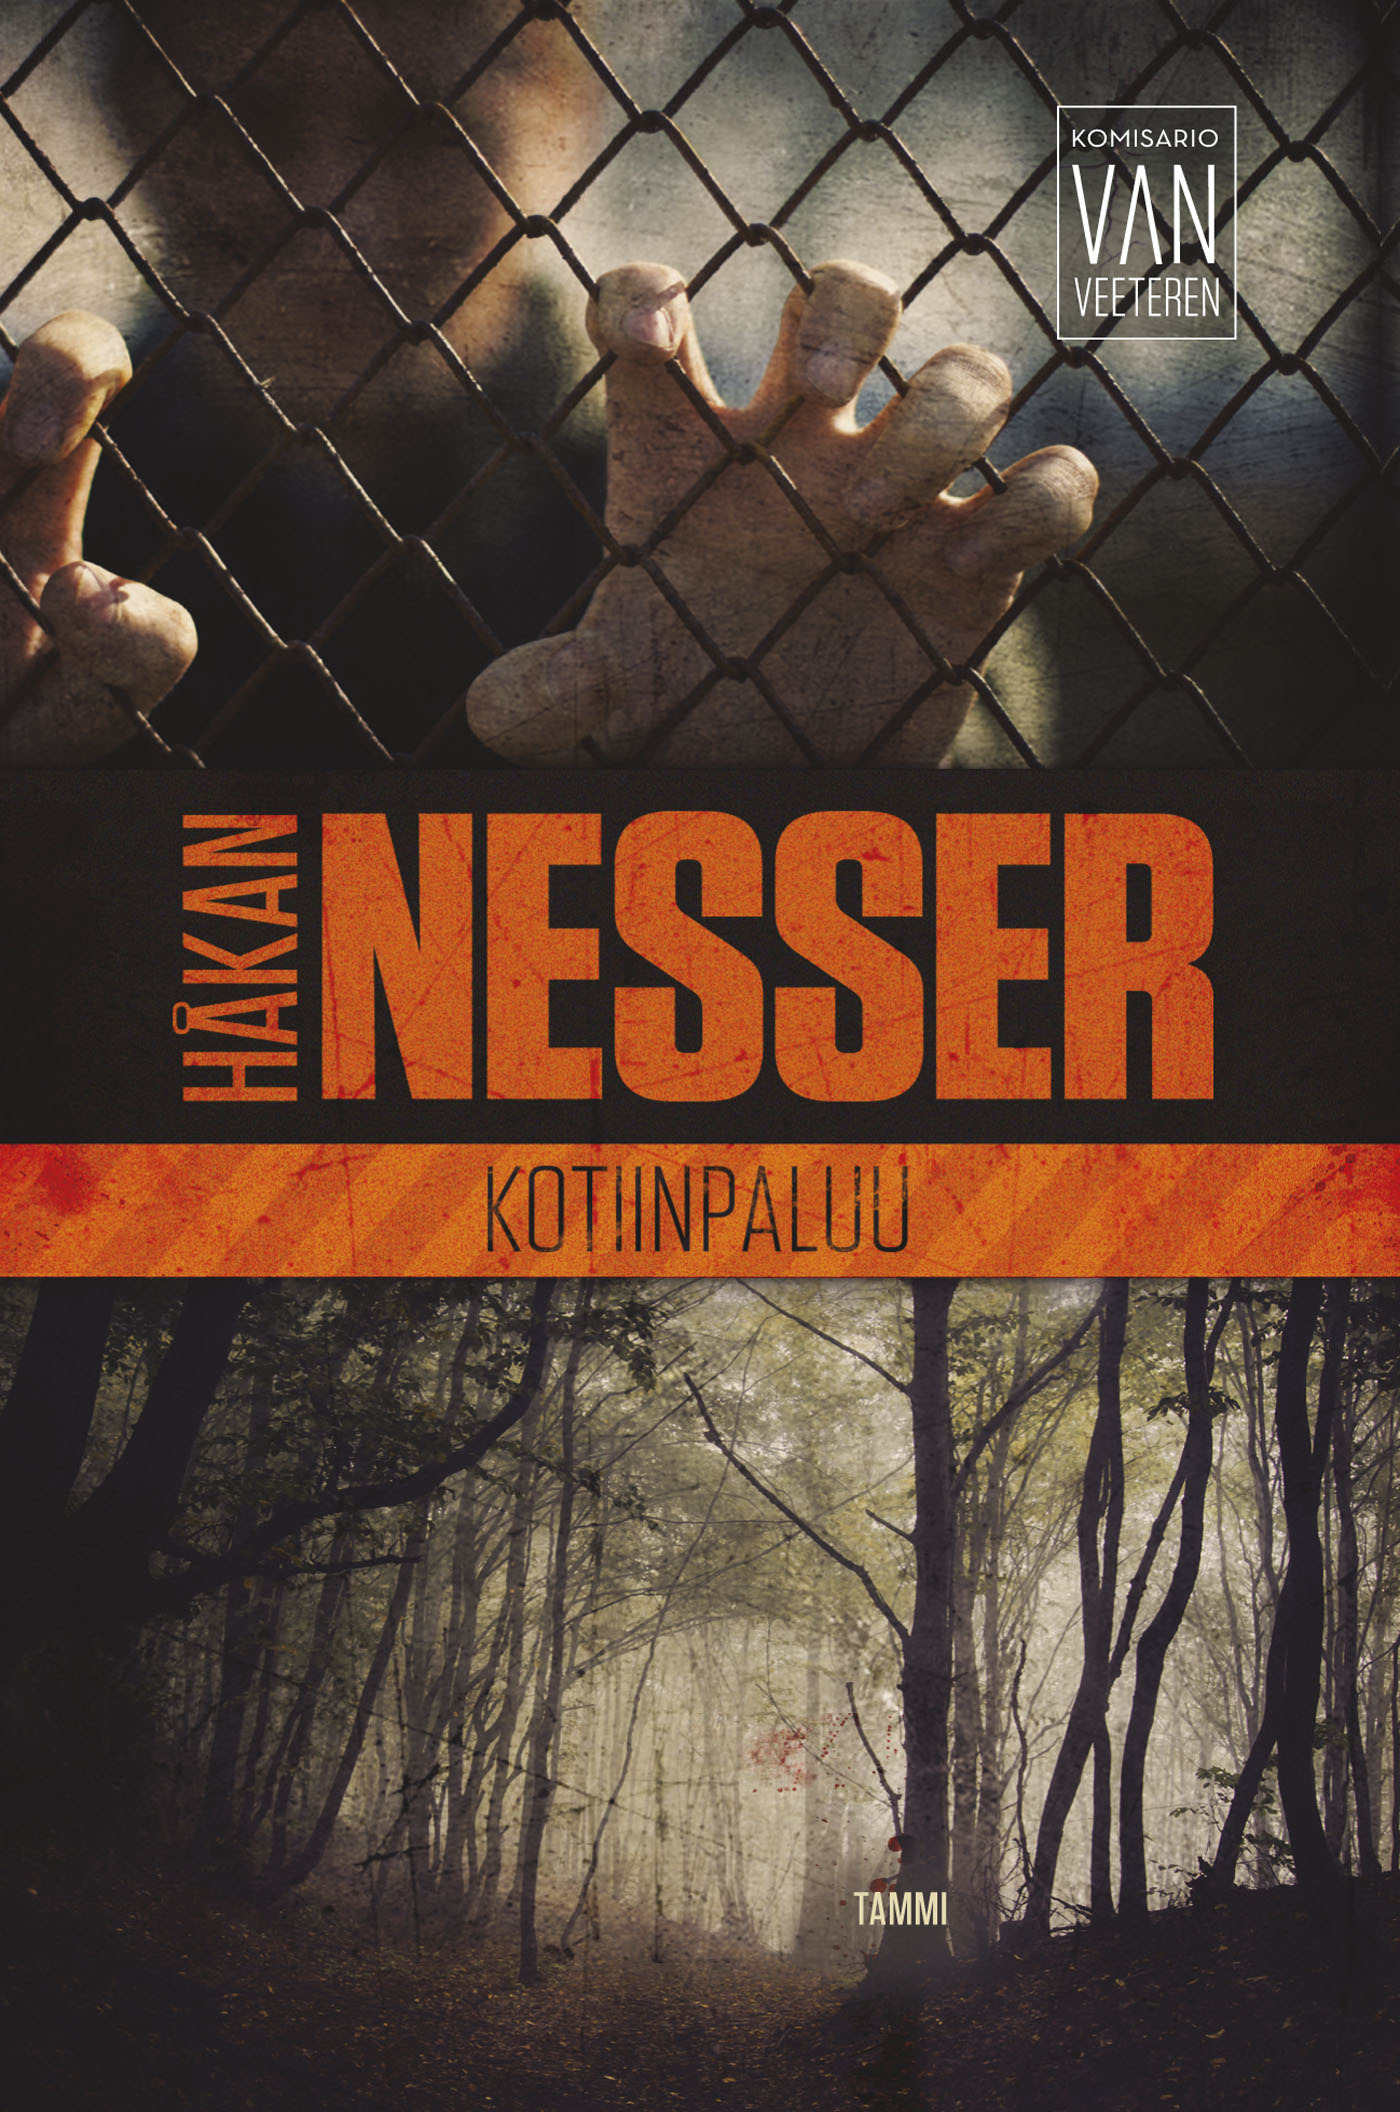 Nesser, Håkan - Kotiinpaluu, e-bok